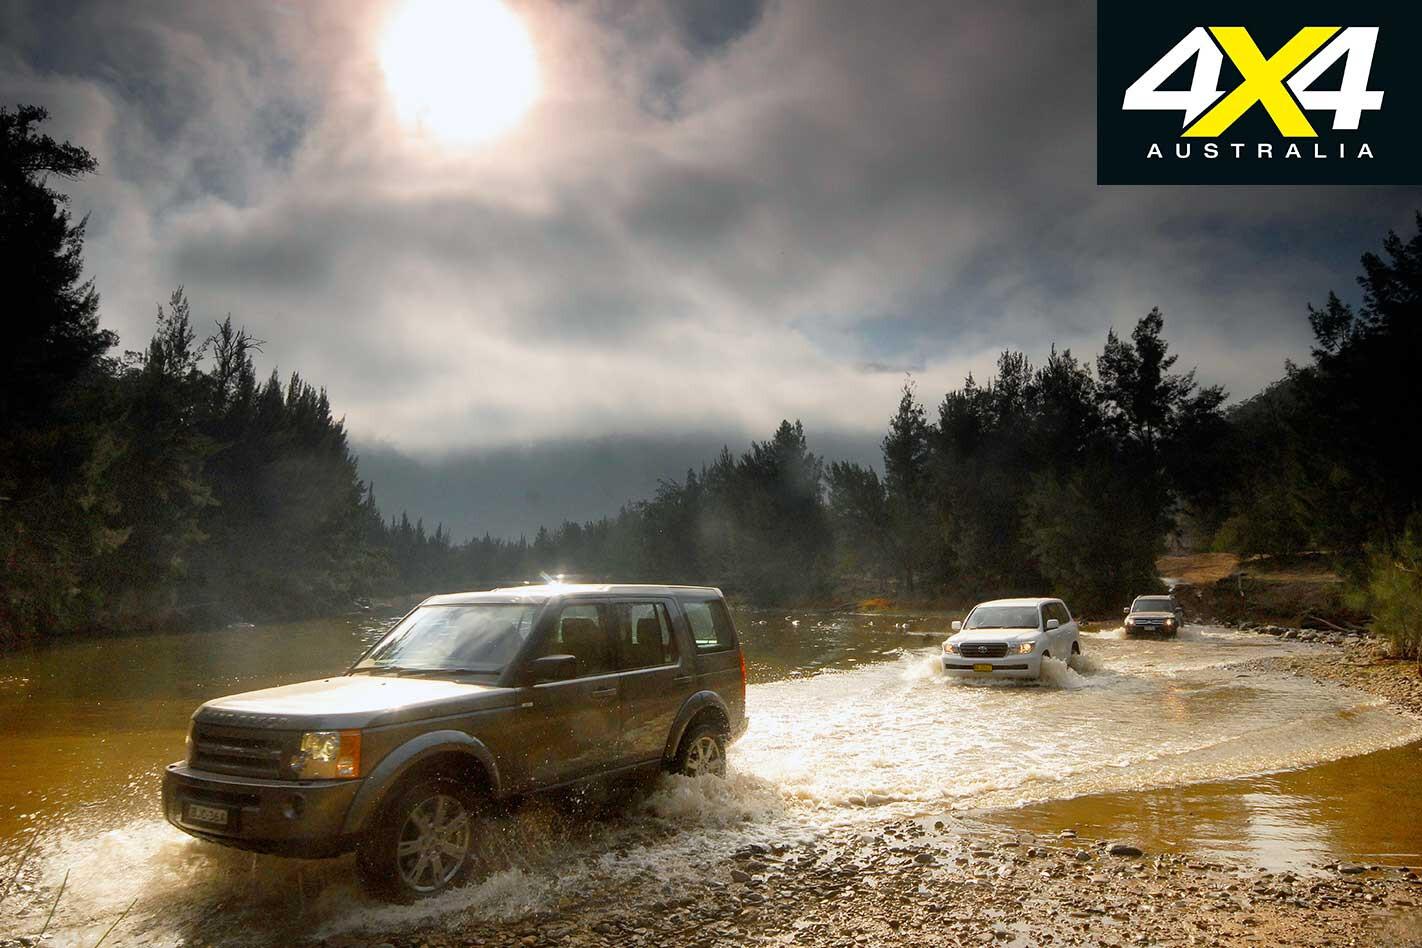 2009 Land Rover Discovery 3 Vs Toyota Land Cruiser Vs Mitsubishi Pajero River Crossing Jpg